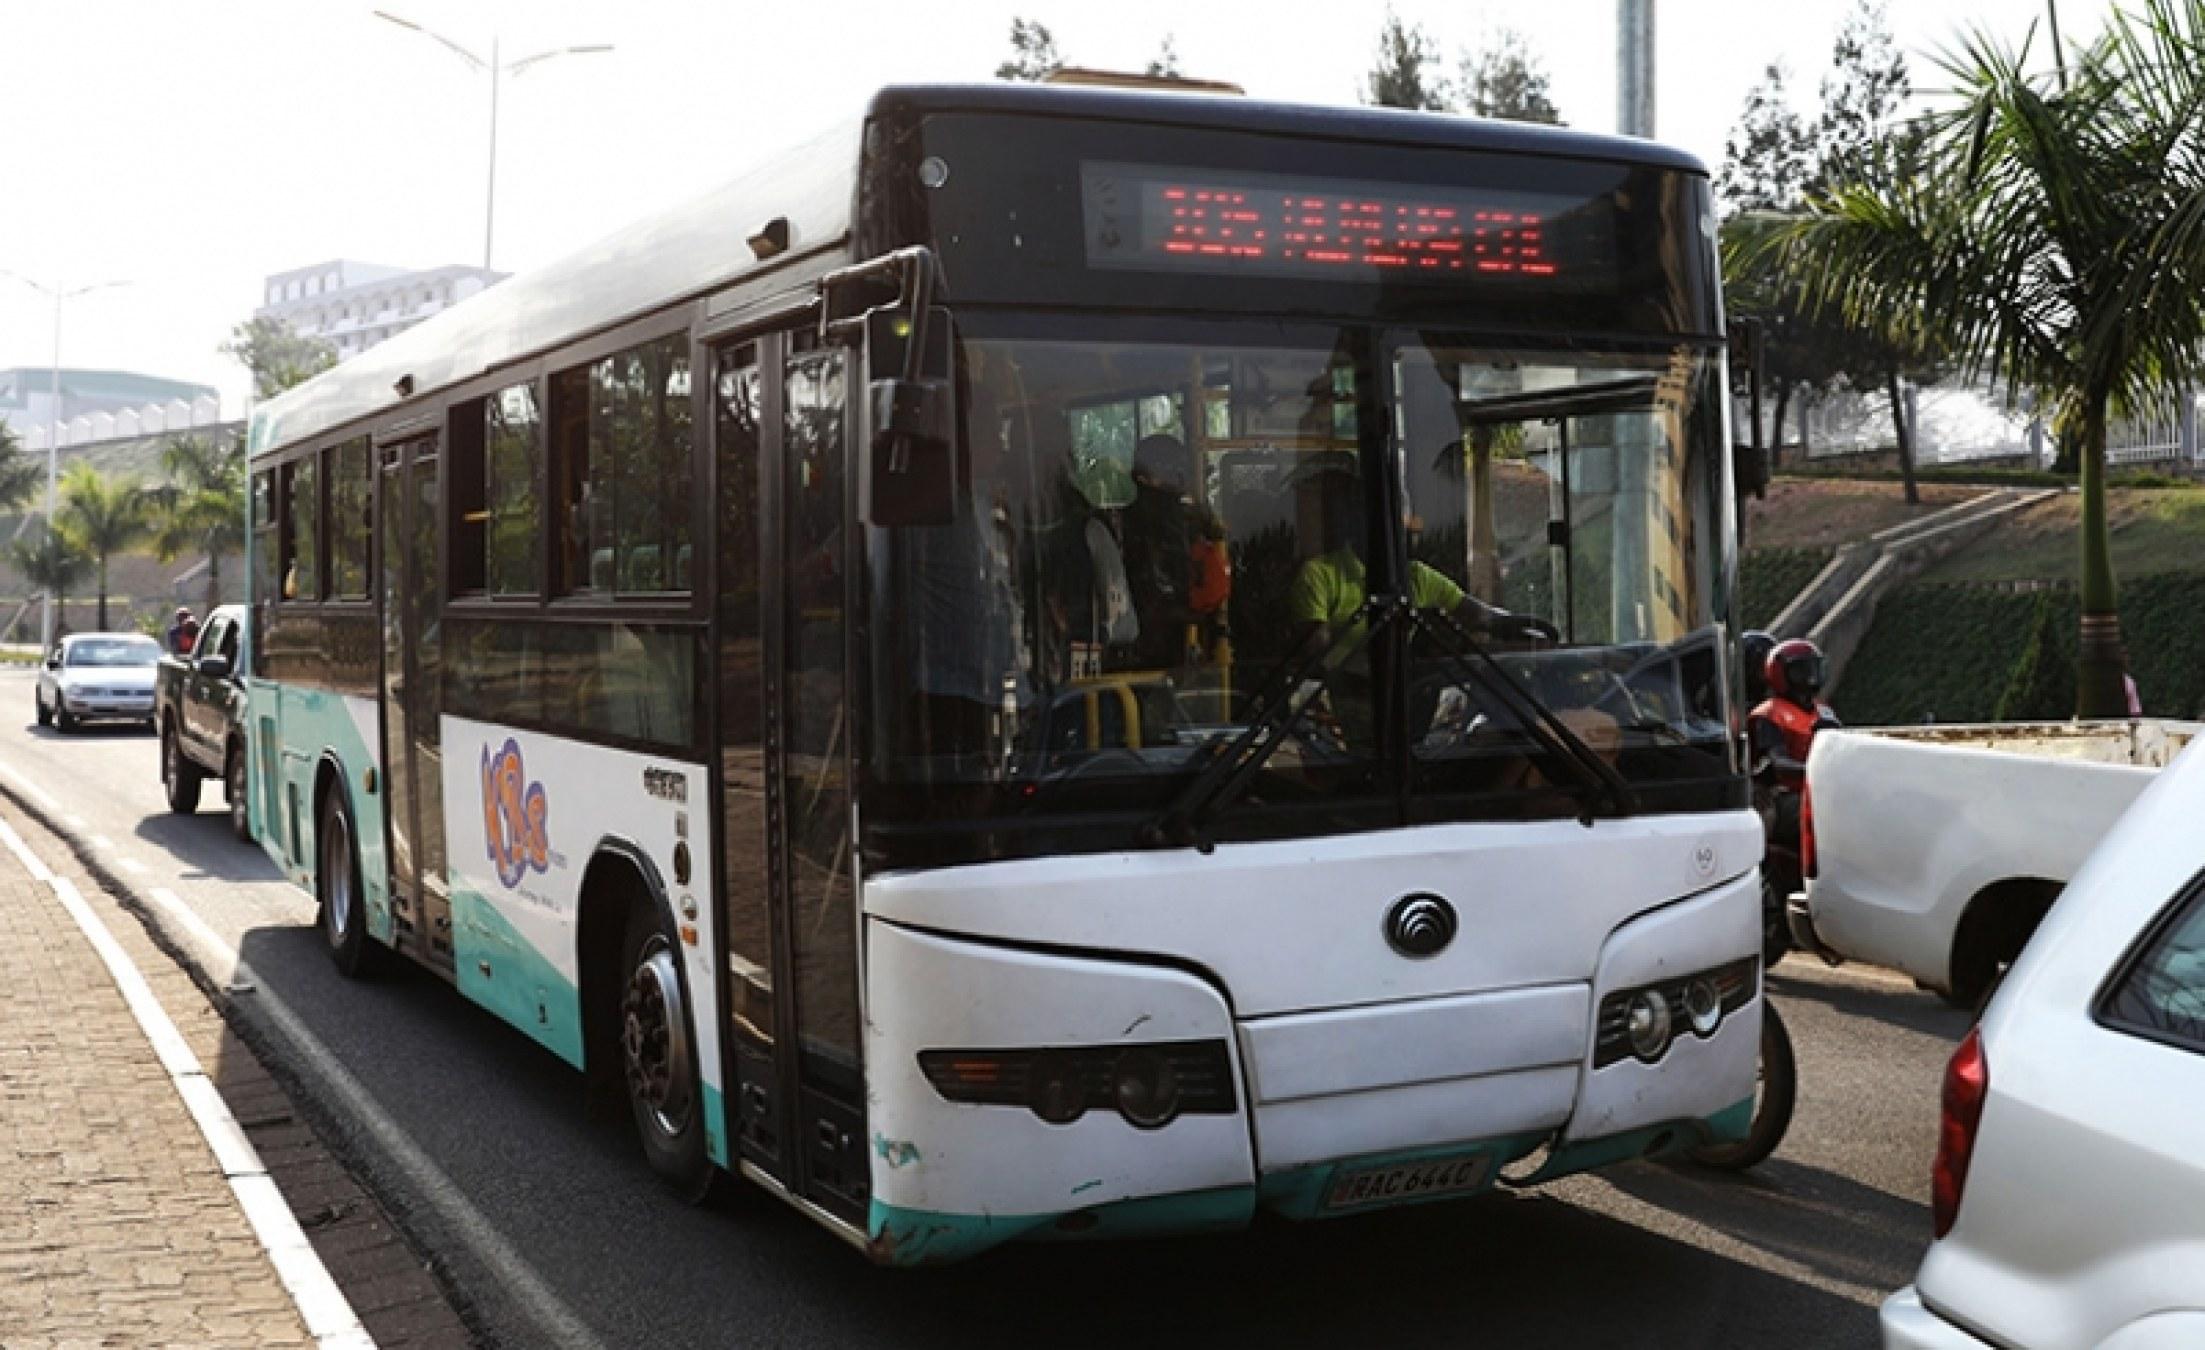 Rwanda: Inside the Next Generation of Kigali's Public Transport